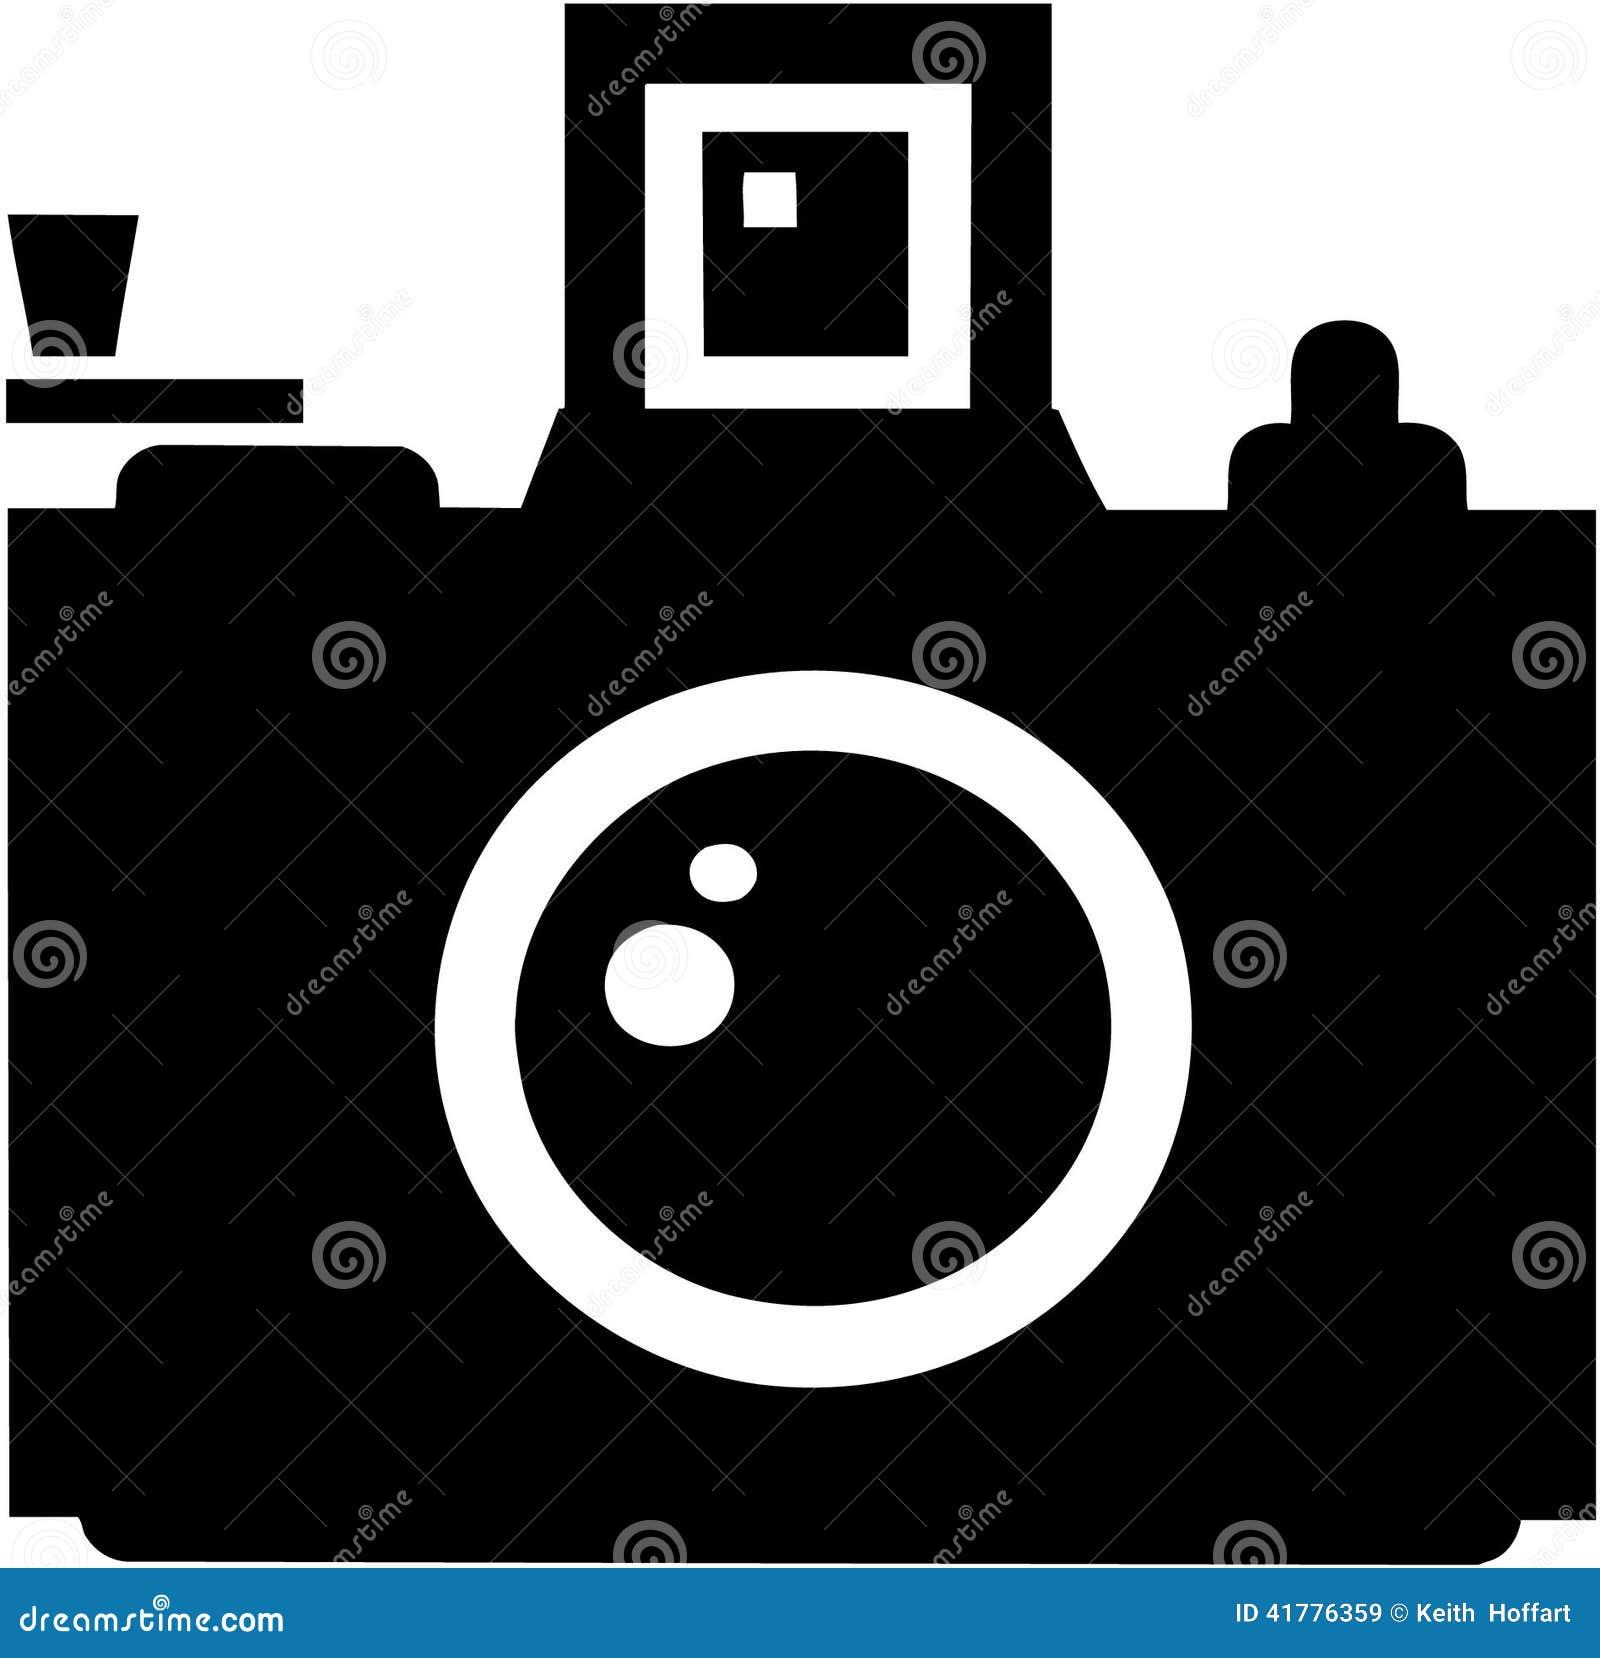 clipart web camera - photo #35